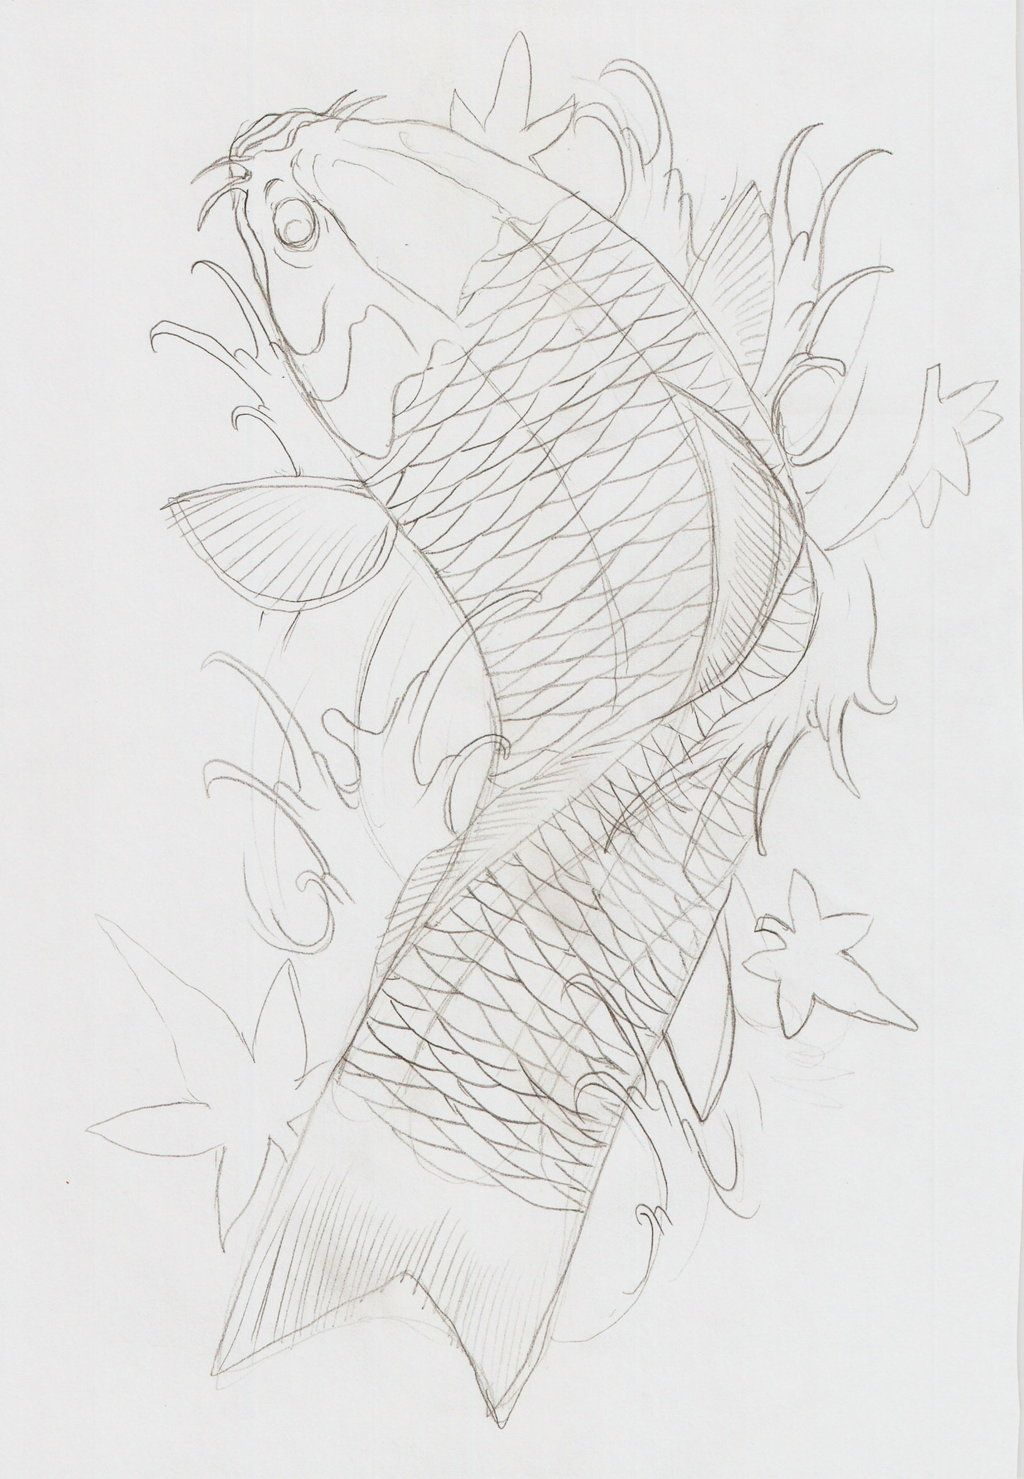 koi fish tattoo outline designs